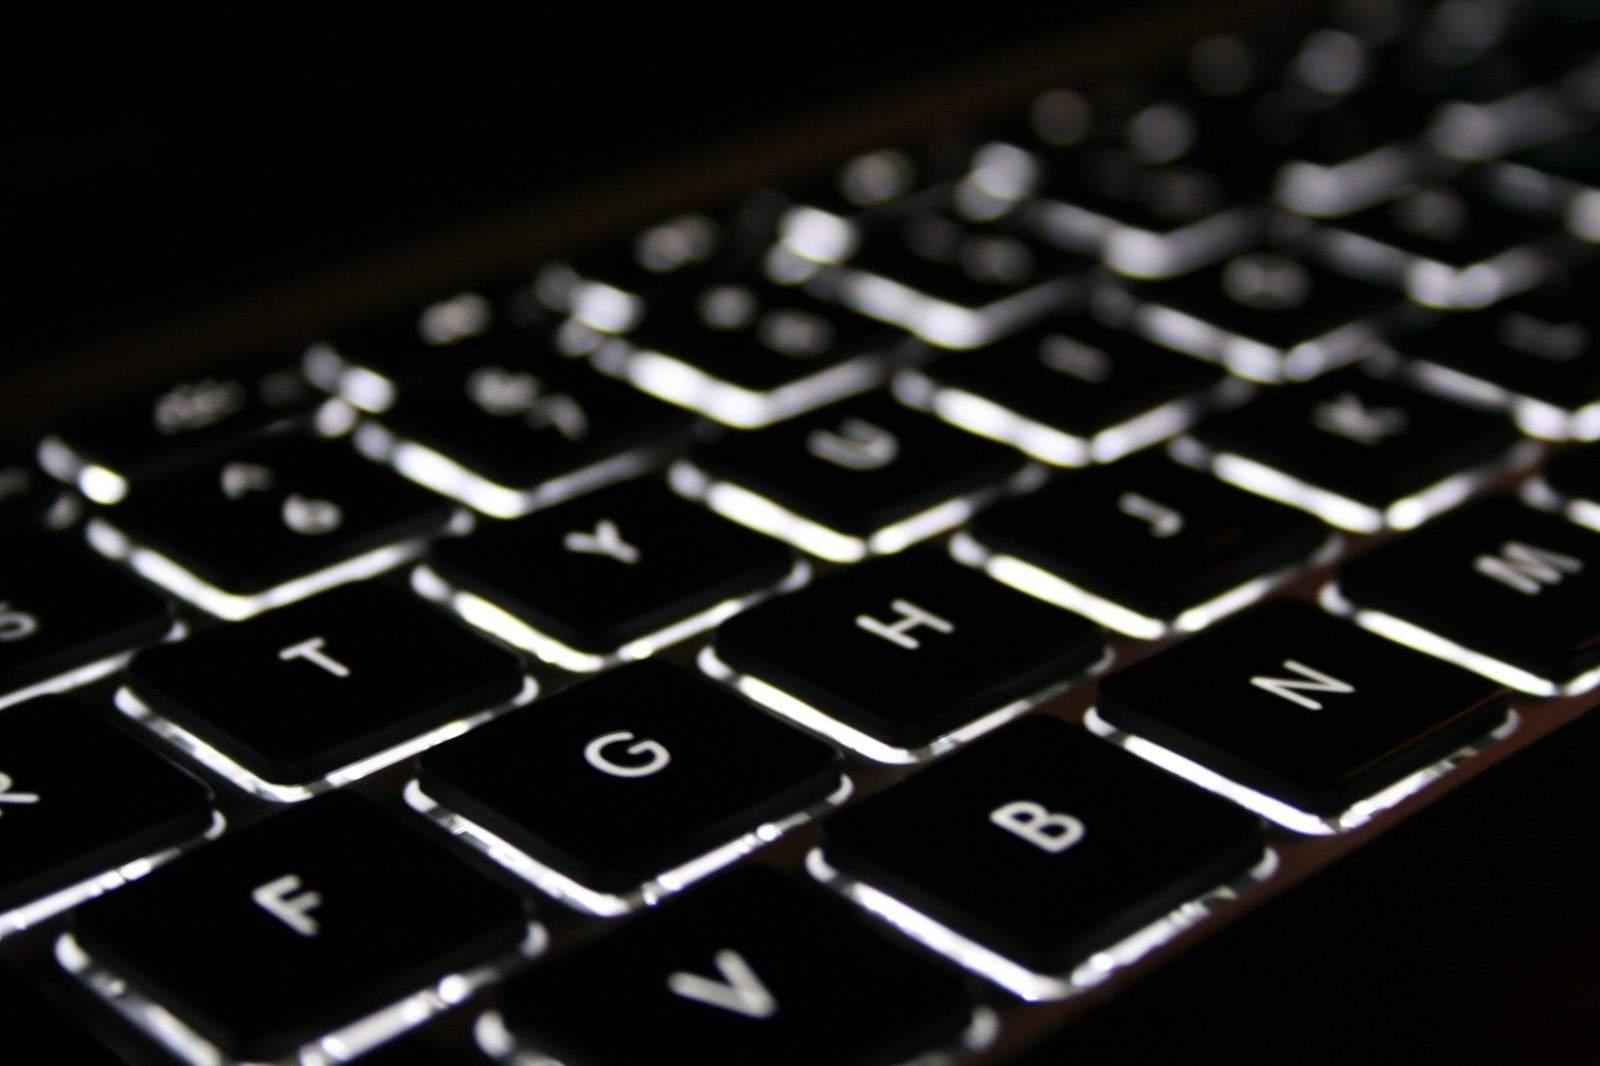 Keyboard Background Wallpaper Elegant Creative Wallpapers For Mac